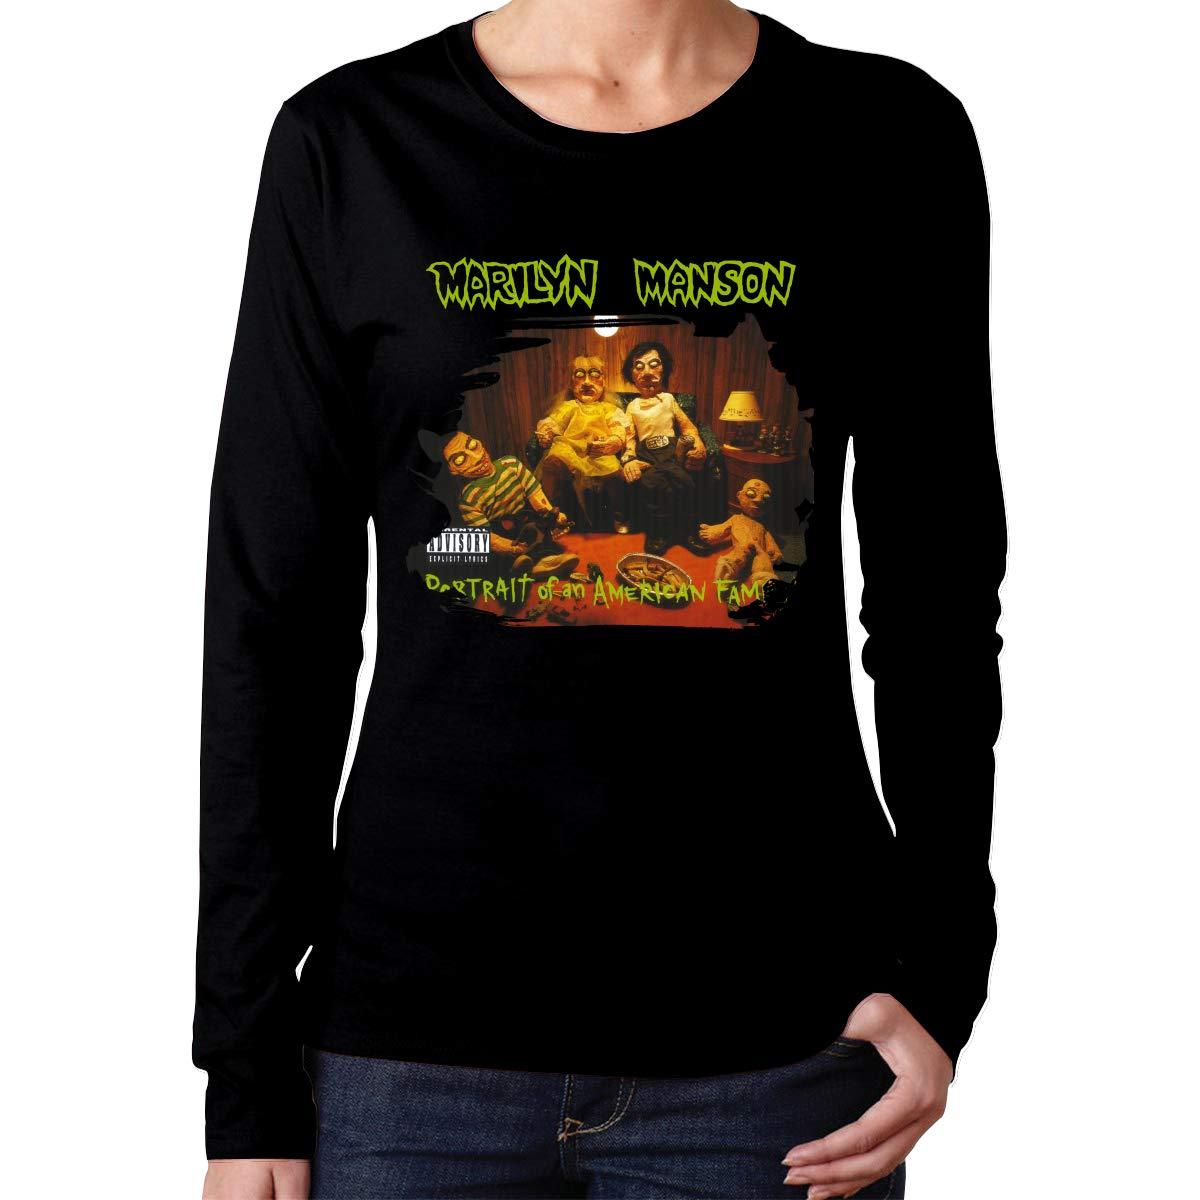 Marilyn Manson Portrait Of An American Family Tee Black Shirts